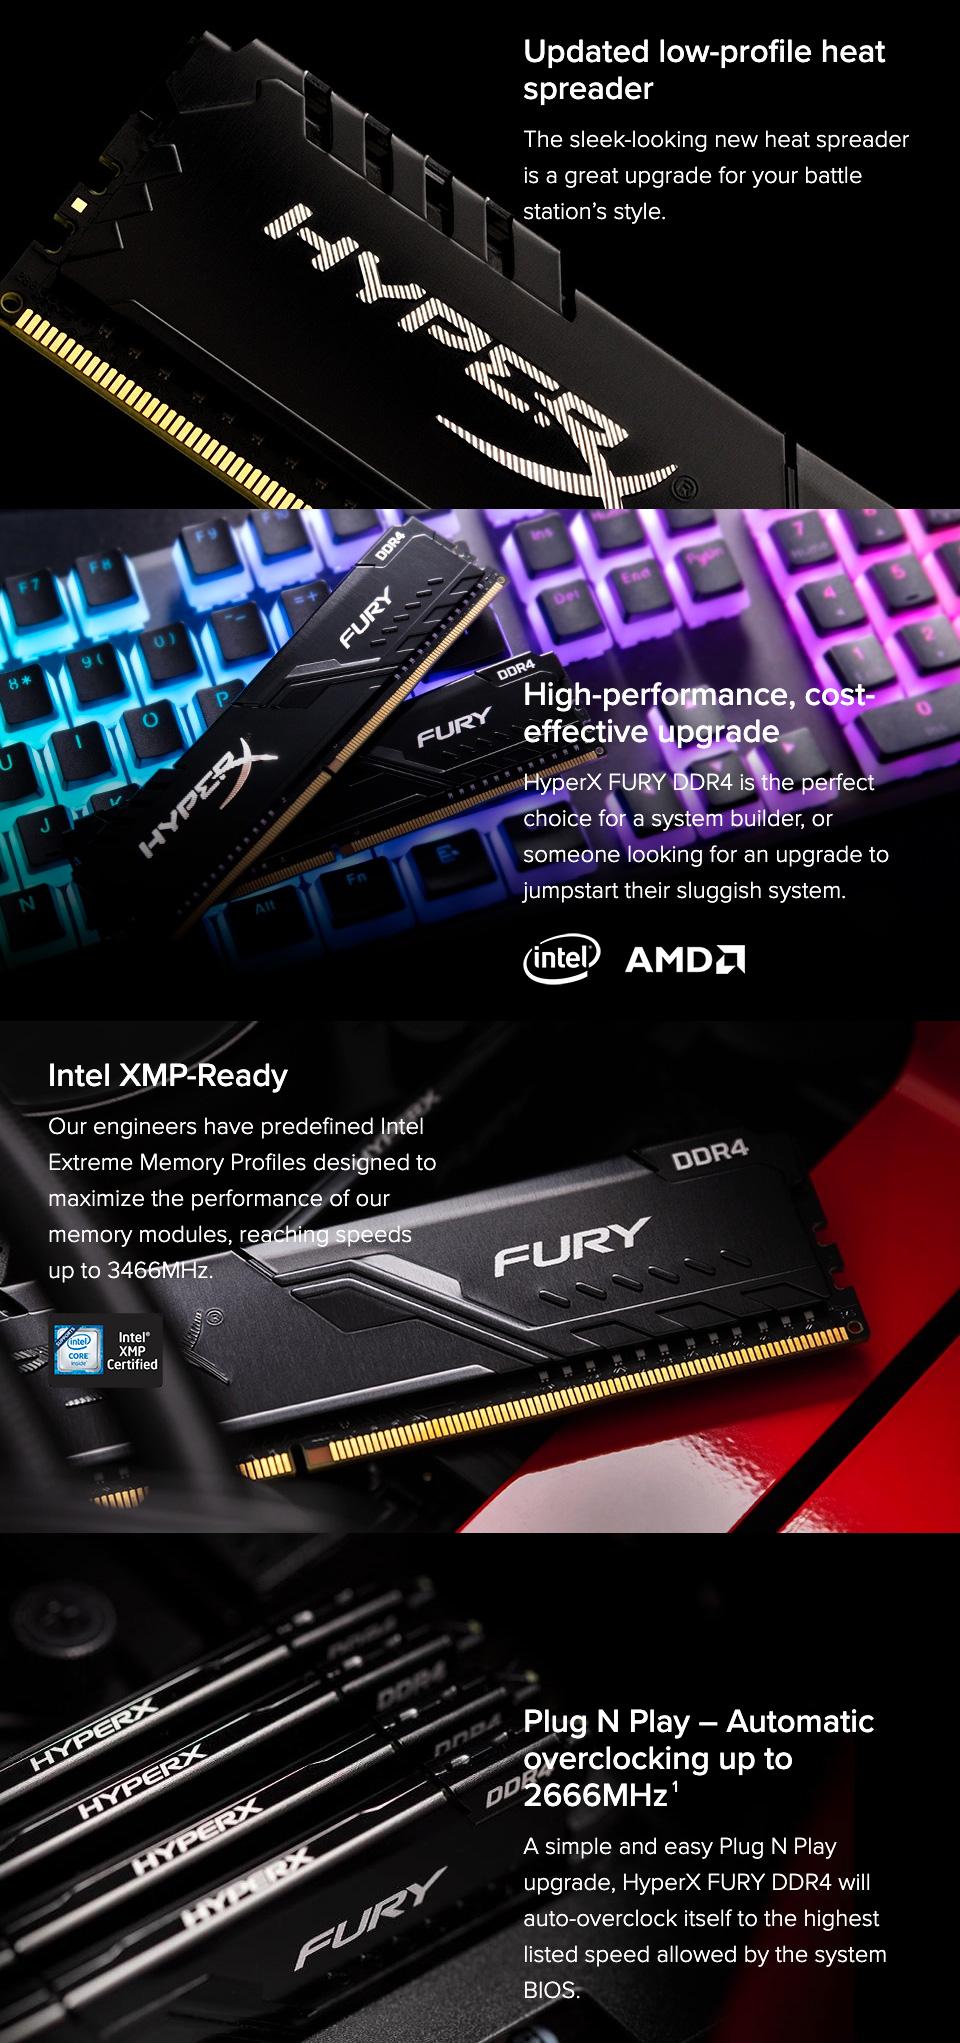 Kingston HyperX Fury HX424C15FB3K2/16 16GB (2x8GB) DDR4 Black features